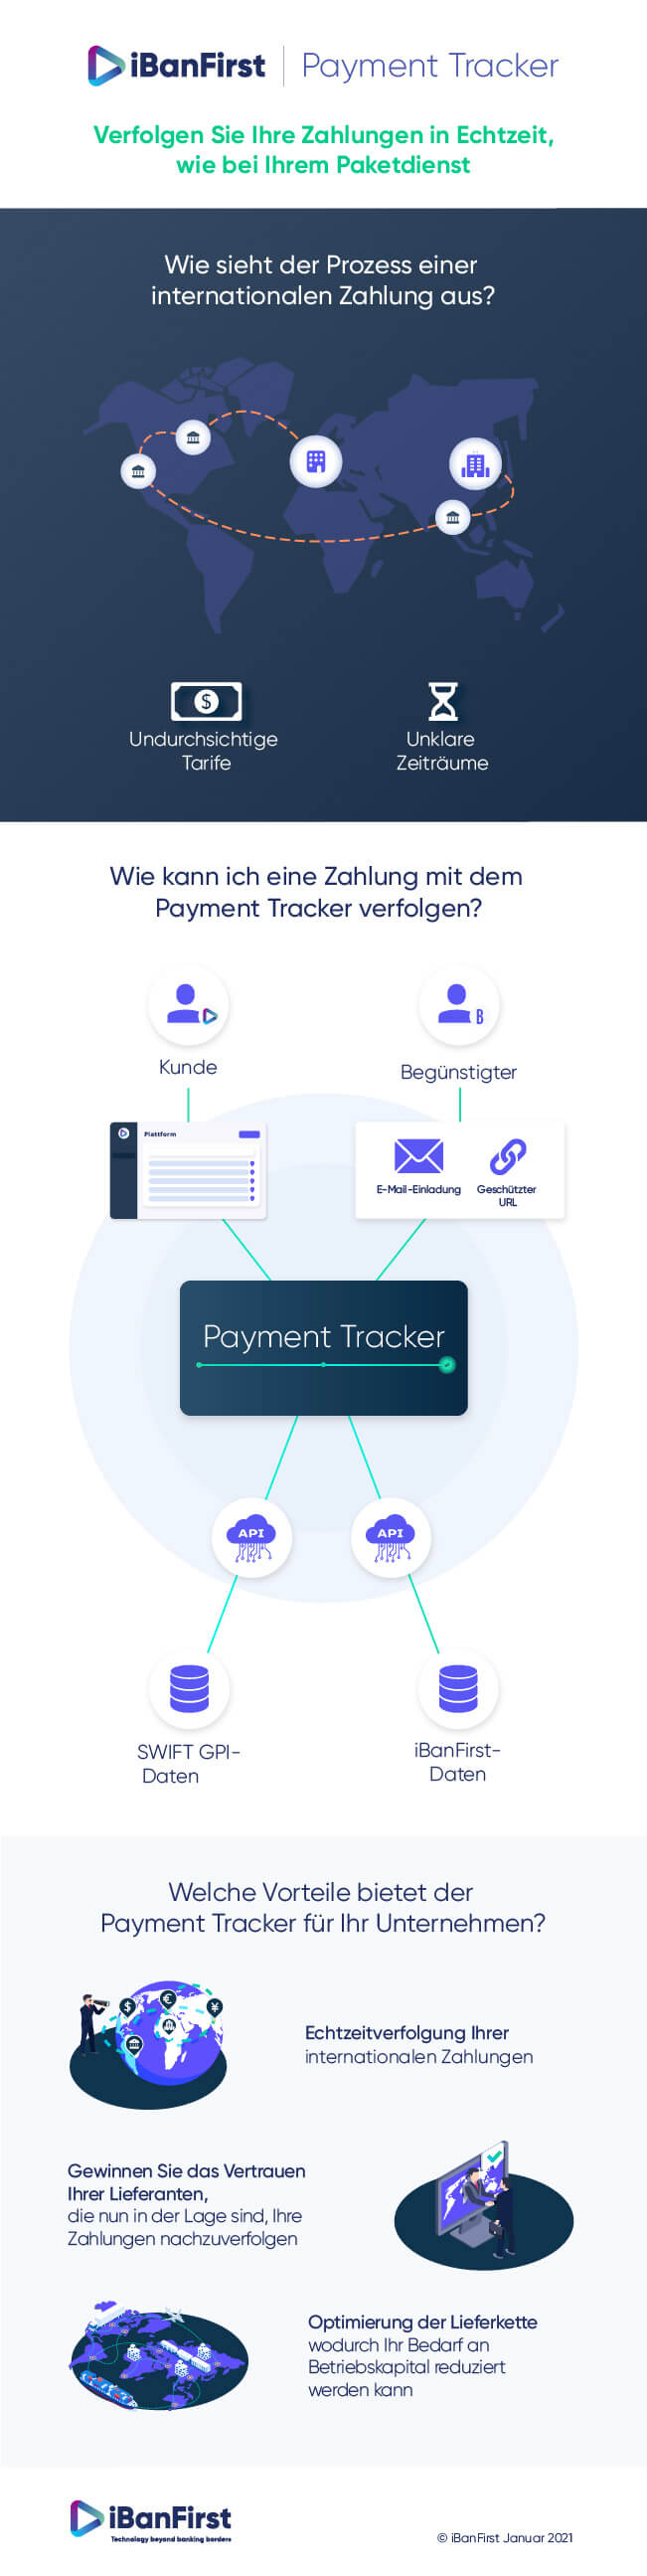 infographie-Payment-tracker-DE